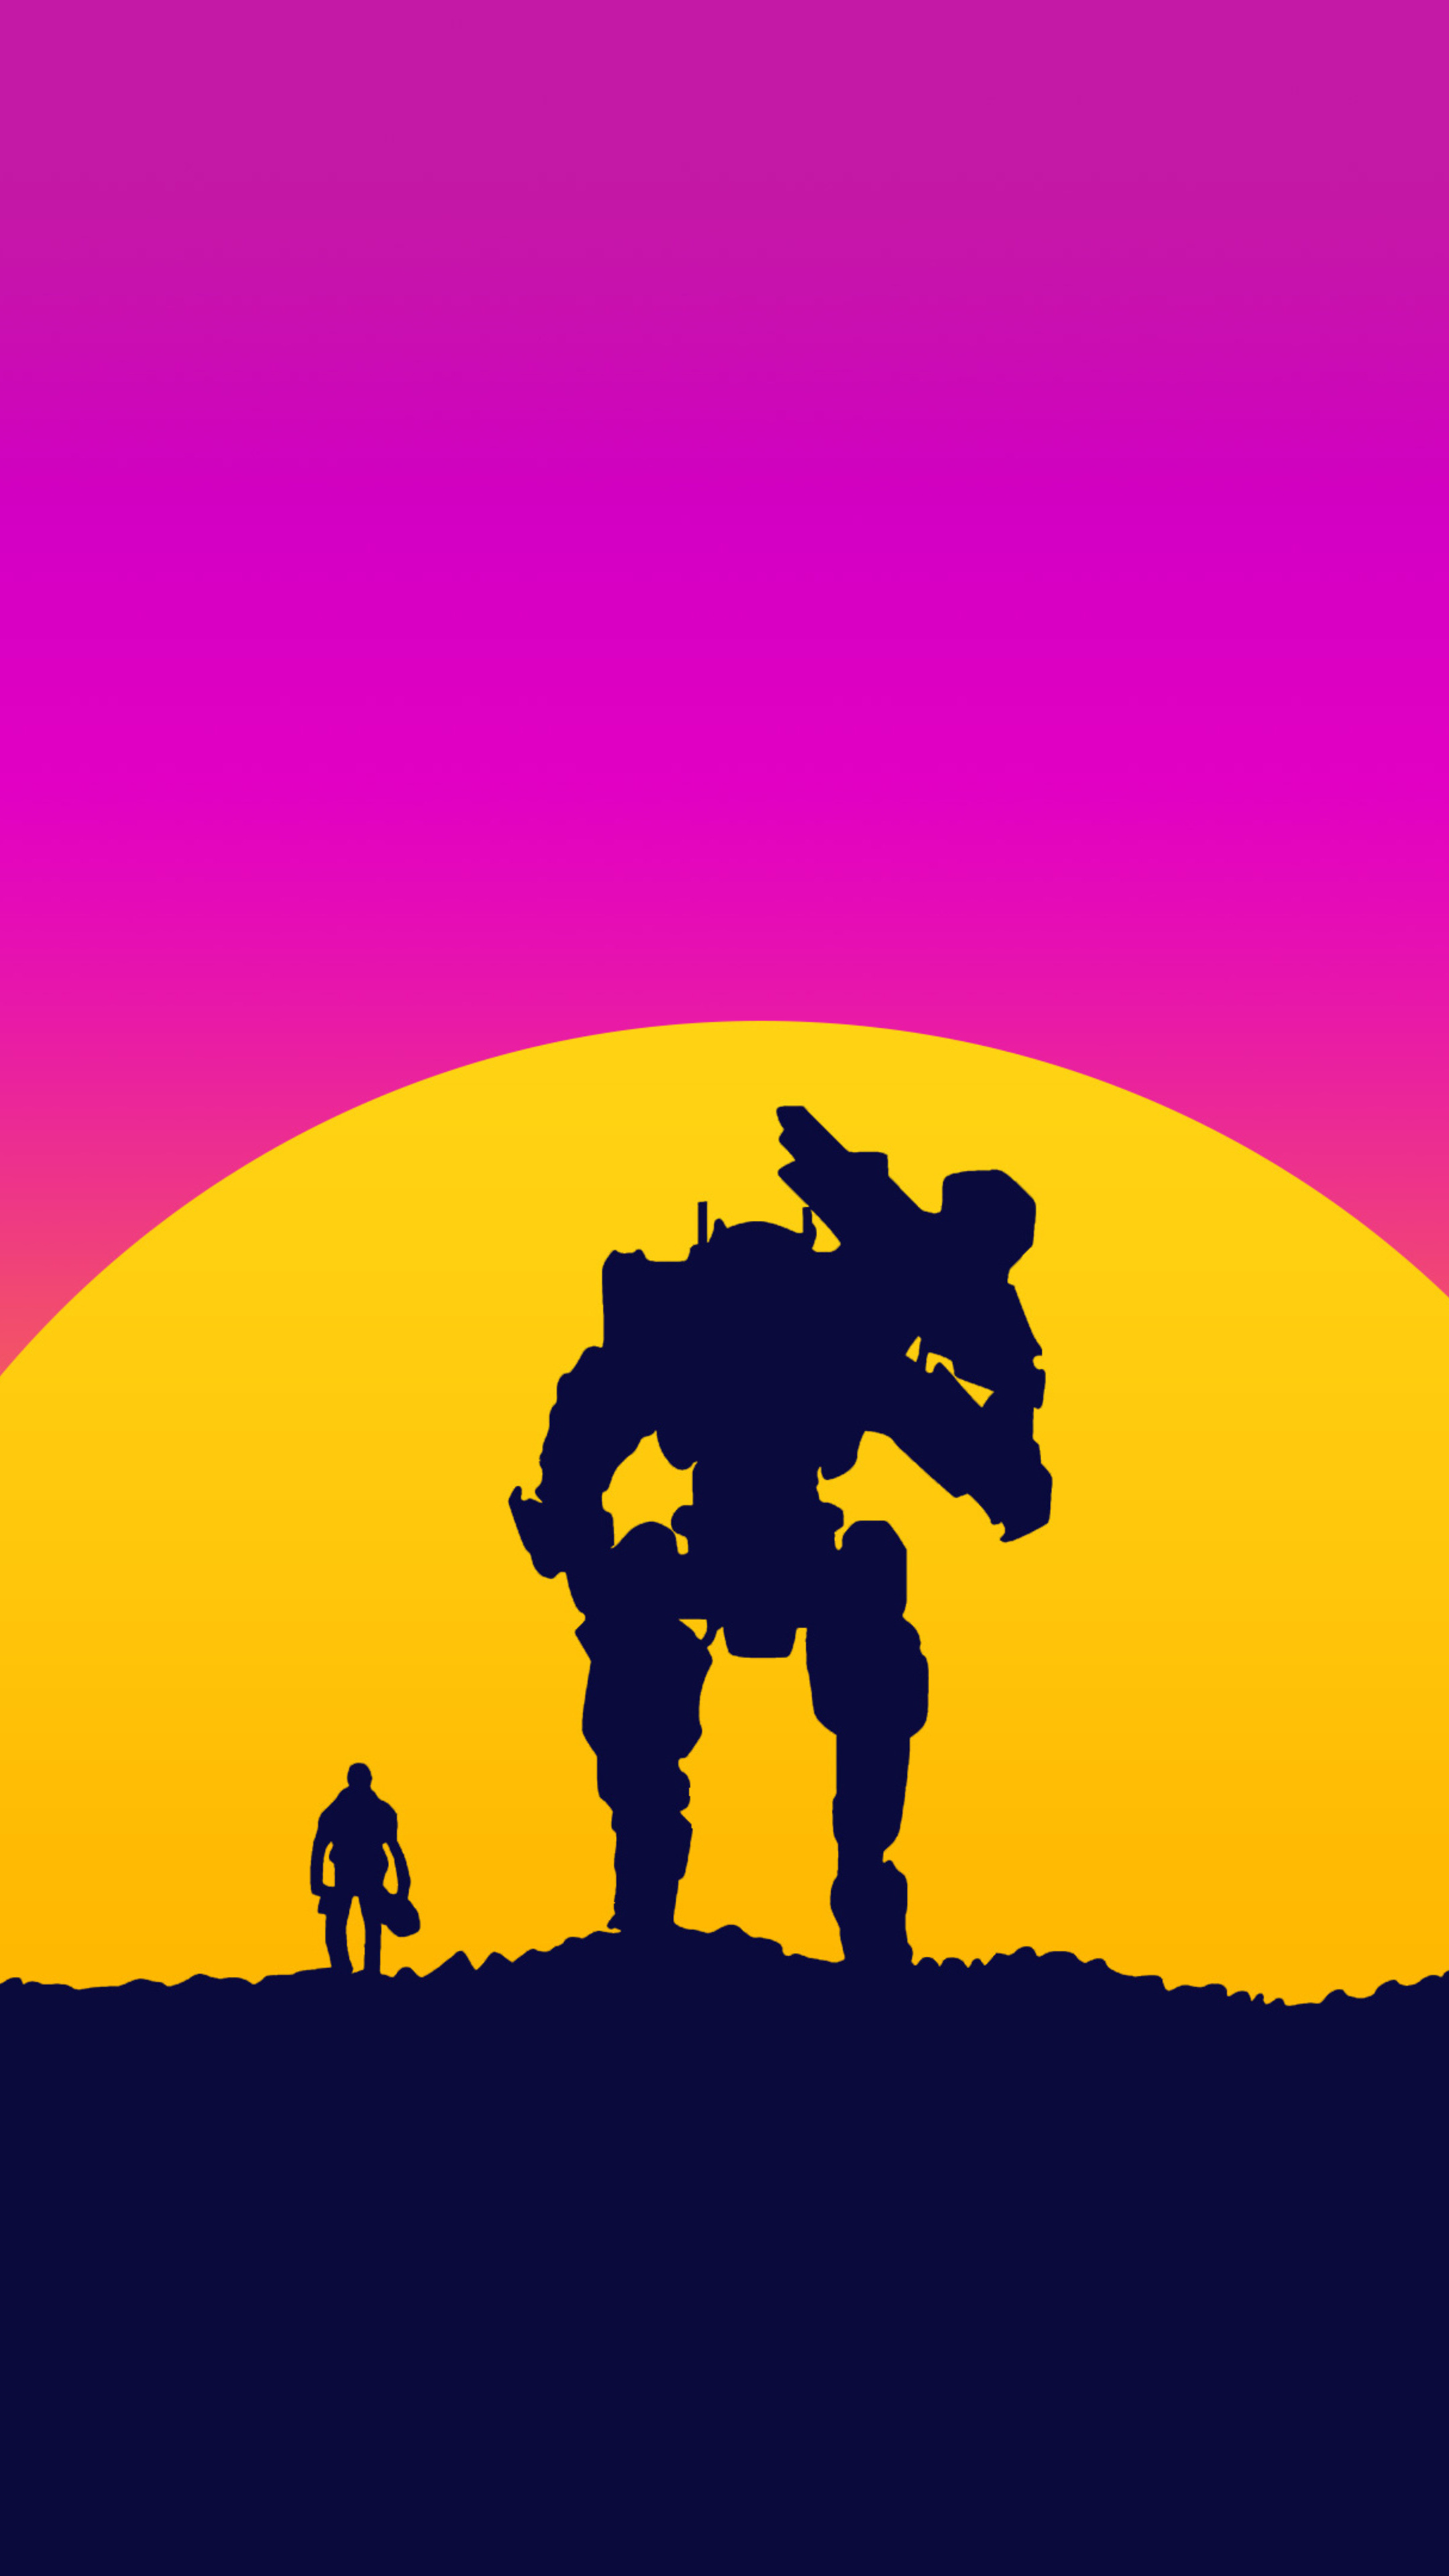 4k-titanfall-2-artwork-ce.jpg